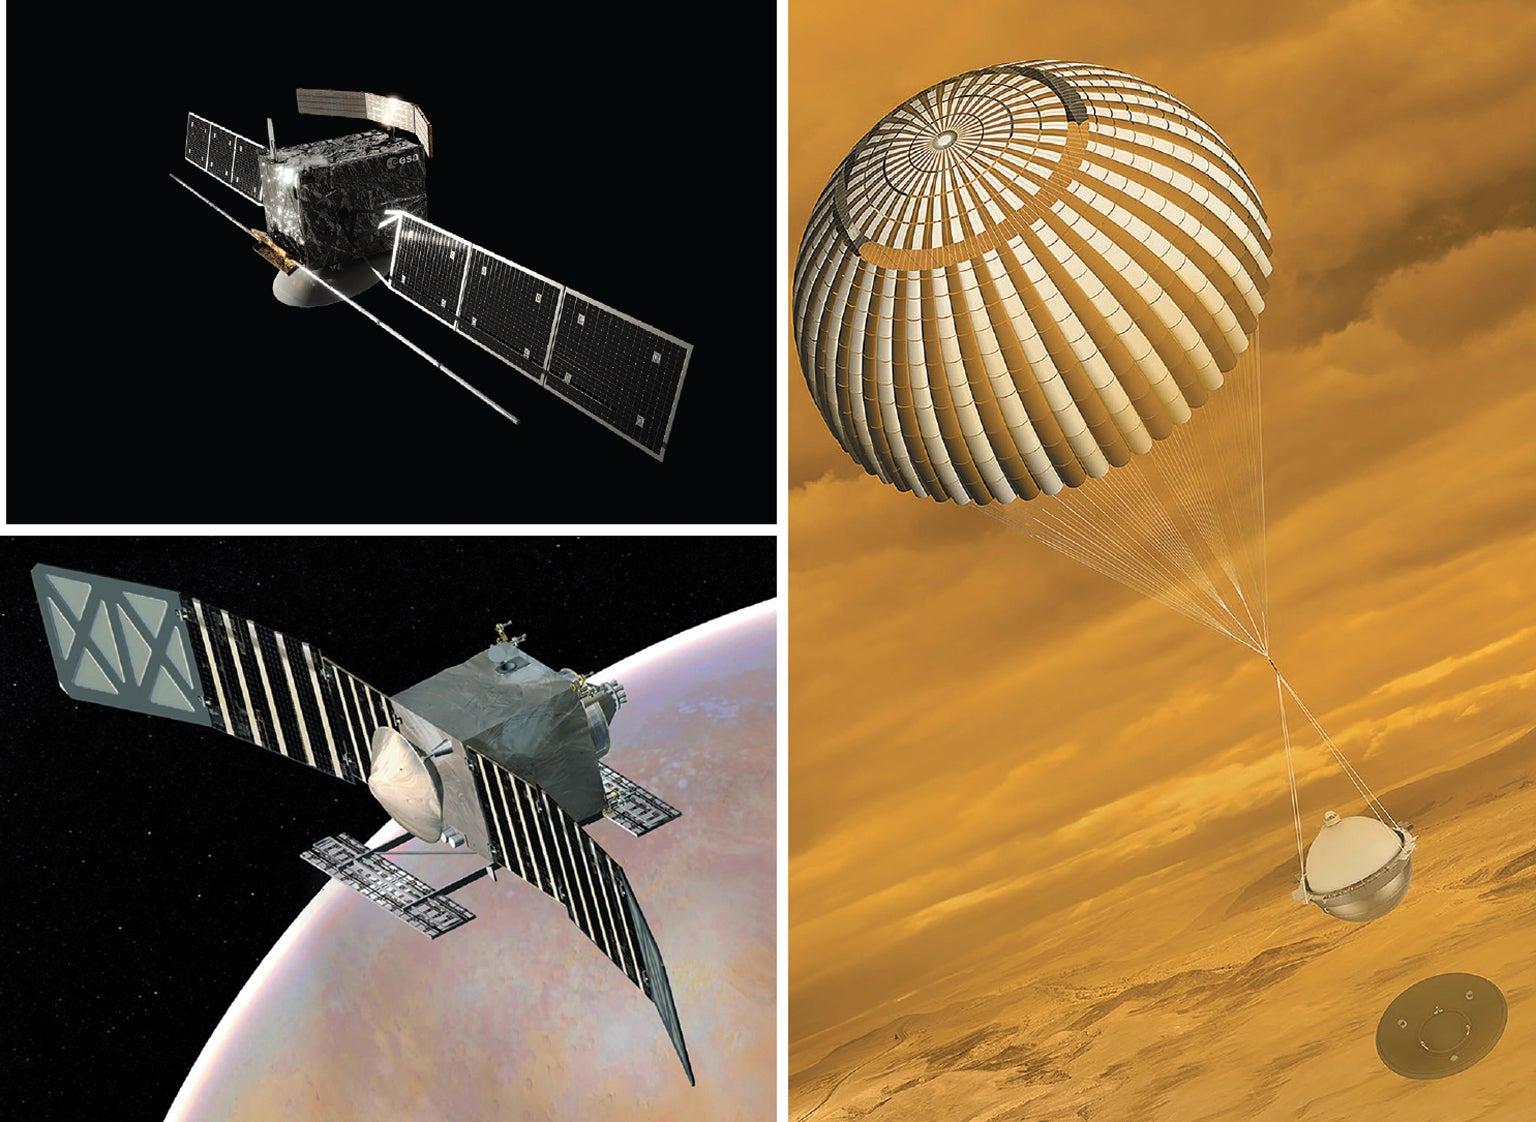 NASA's VERITAS spacecraft concept; Atmospheric probe concept; ESA's EnVision spacecraft concept.